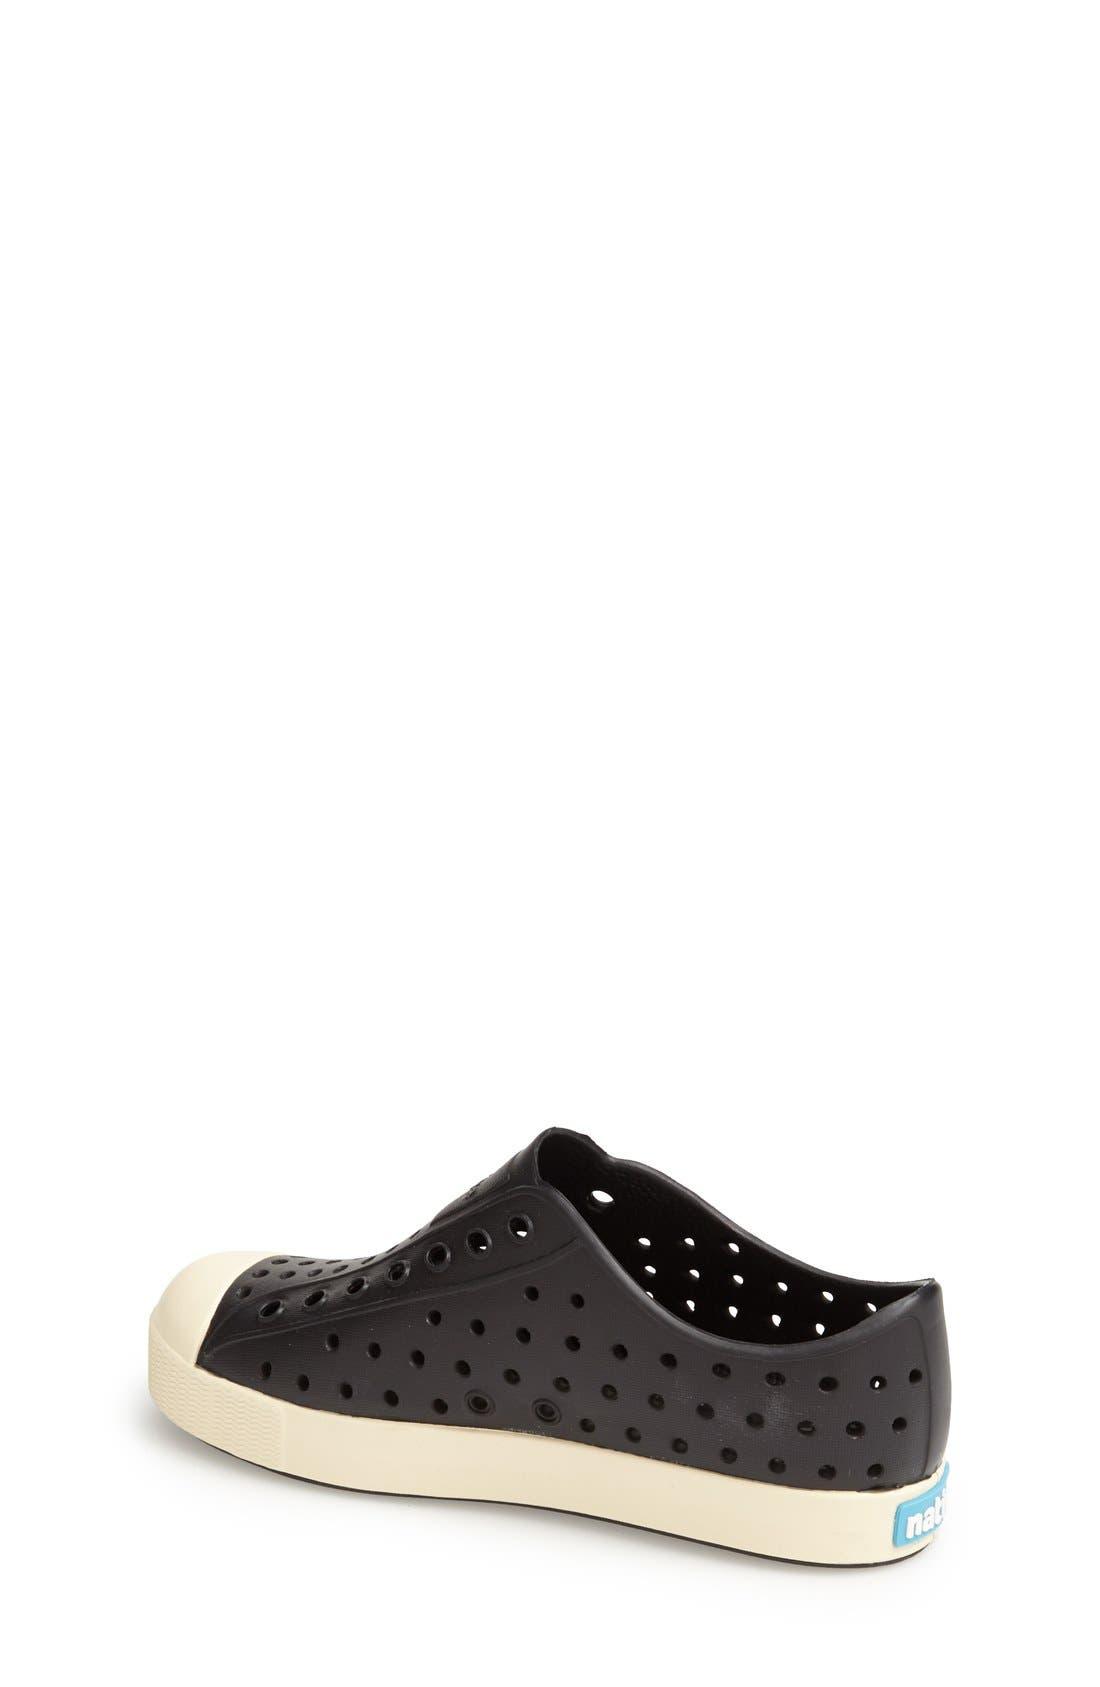 'Jefferson' Water Friendly Slip-On Sneaker,                             Alternate thumbnail 118, color,